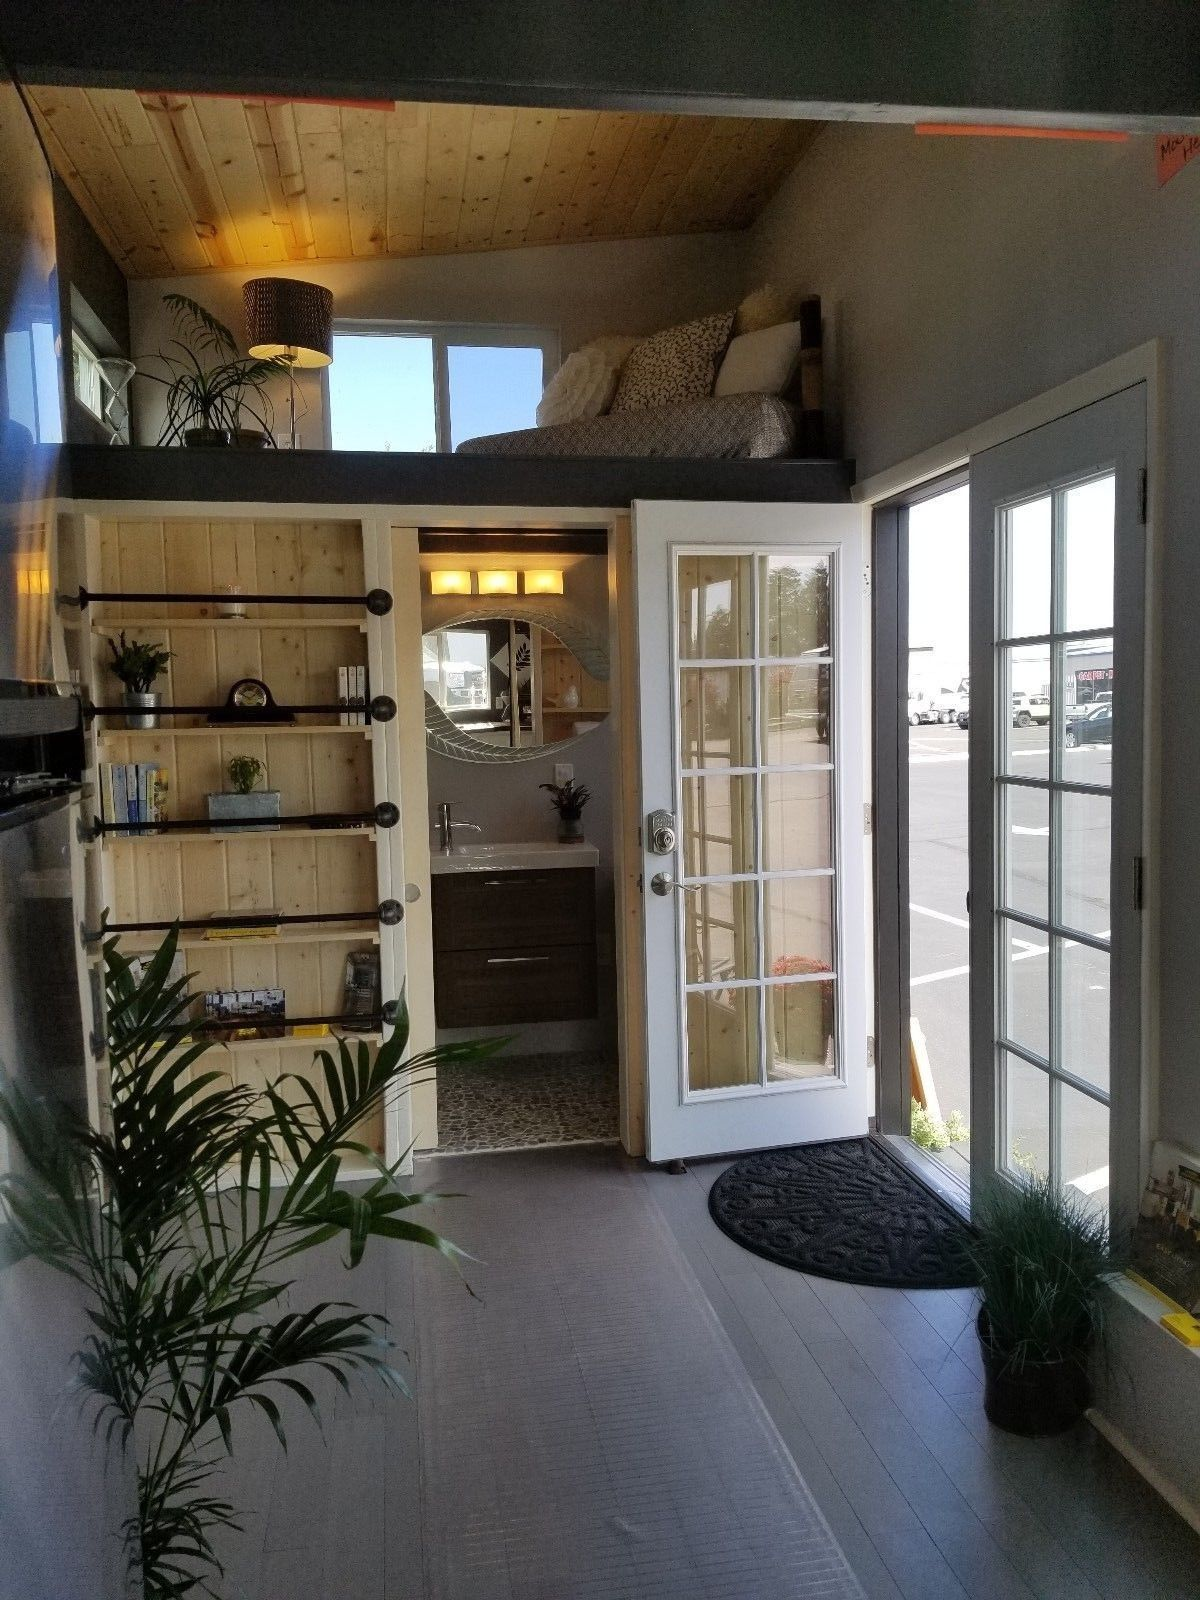 Details about 26' Custom Built Tiny House #tinyhousebathroom